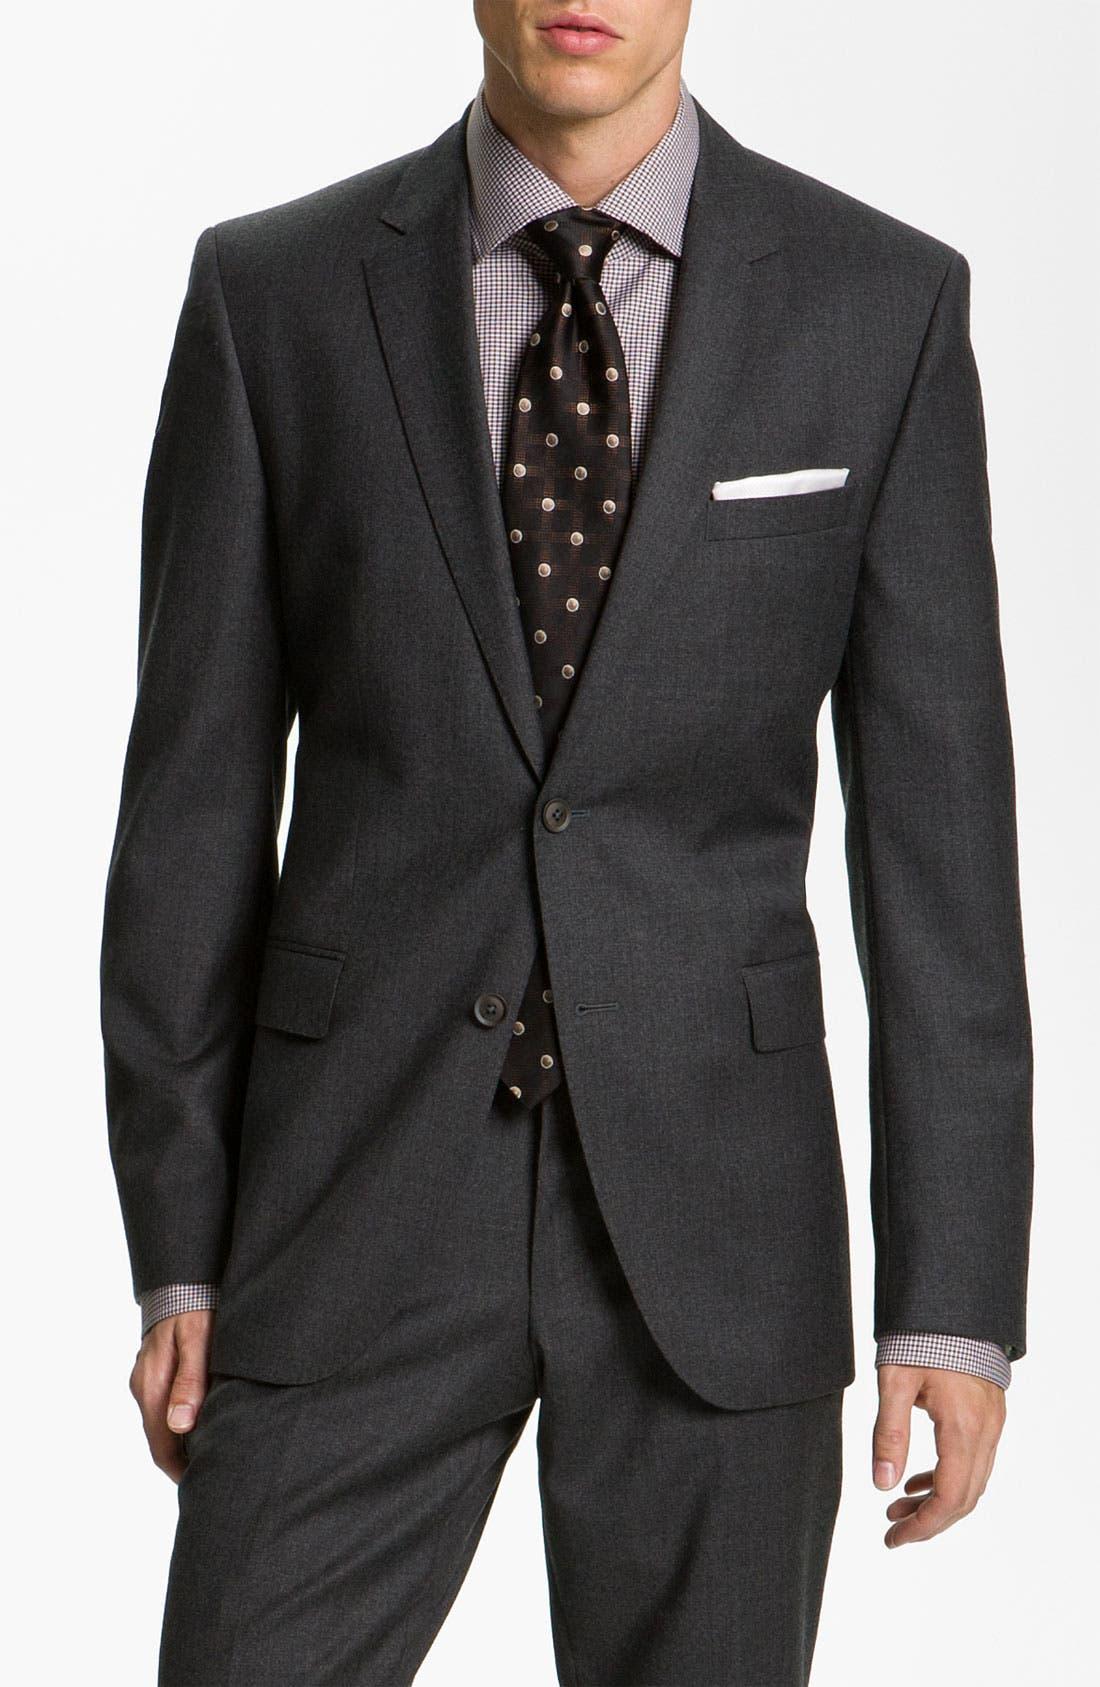 Alternate Image 1 Selected - BOSS Black 'Key/Shaft' Trim Fit Suit